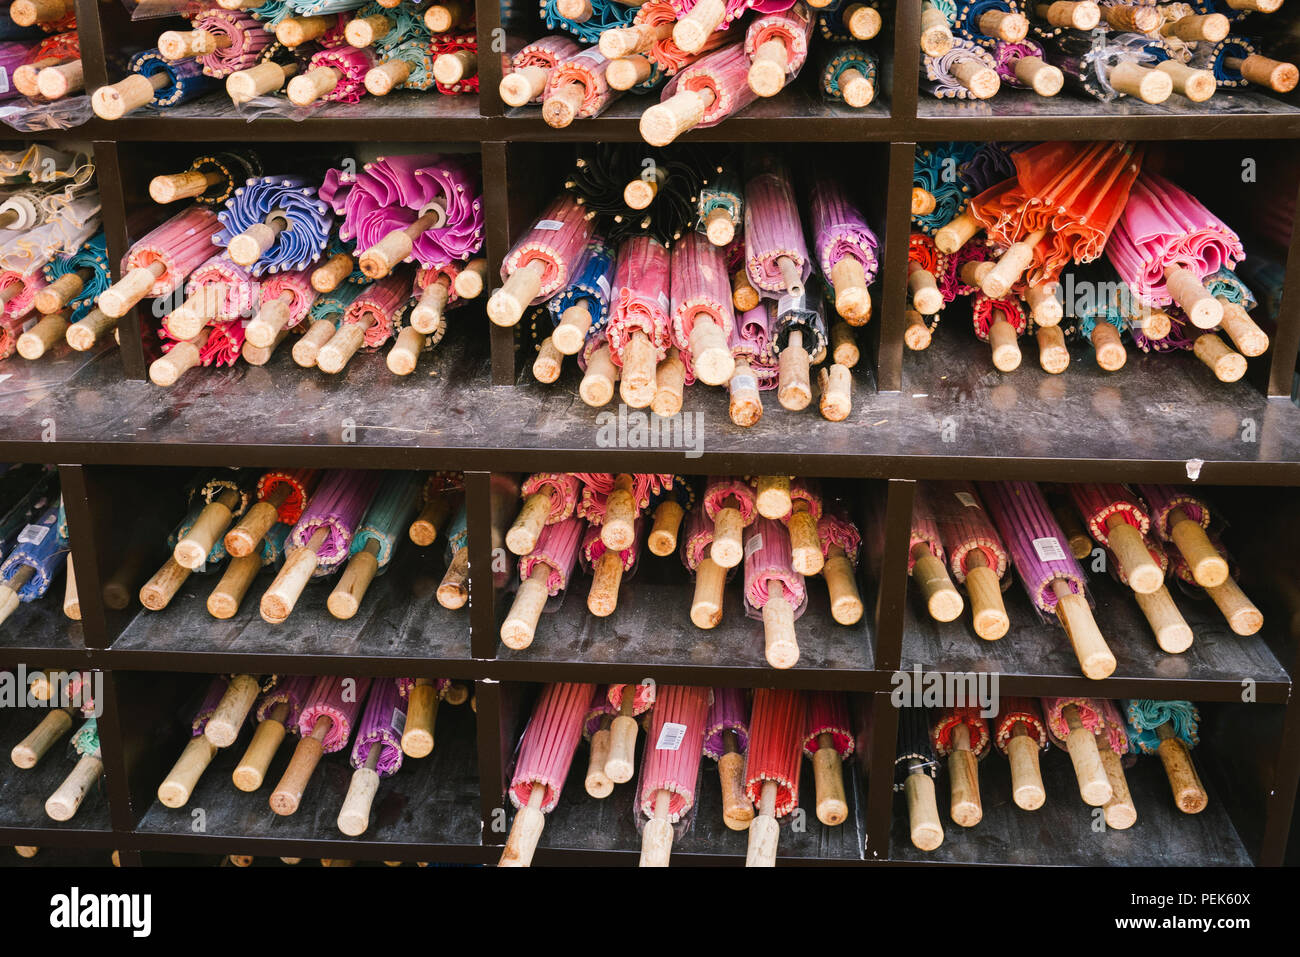 Parasol umbrellas at a market stall Stock Photo